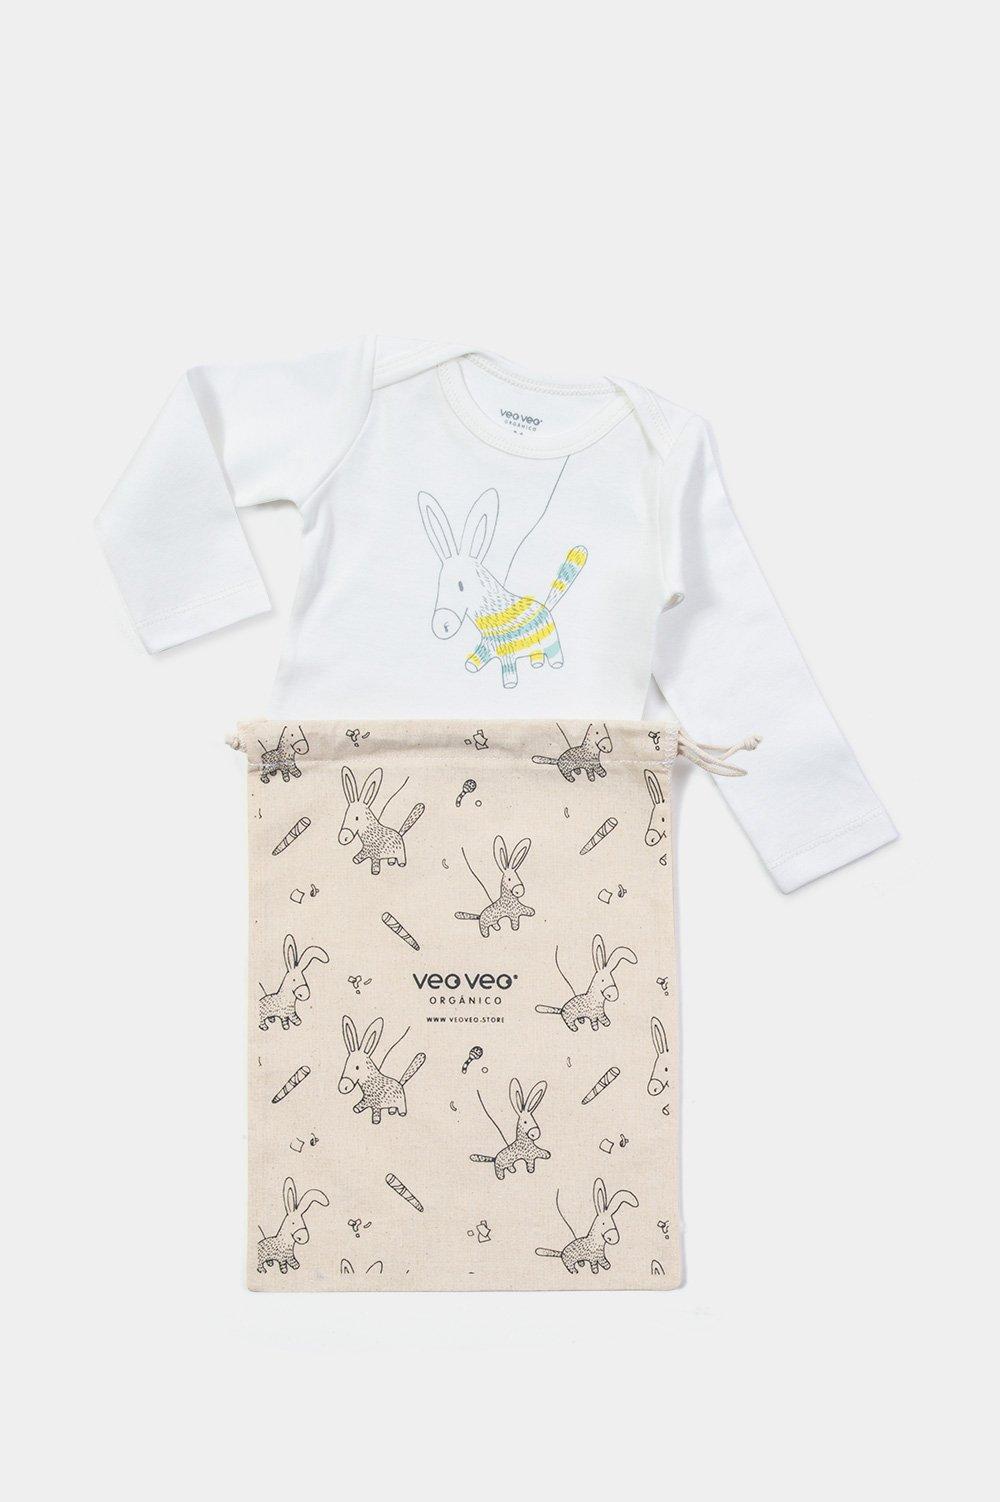 veoveo.store_accesorios: mantas_algodón orgánico- gift pack-baby shower regalo